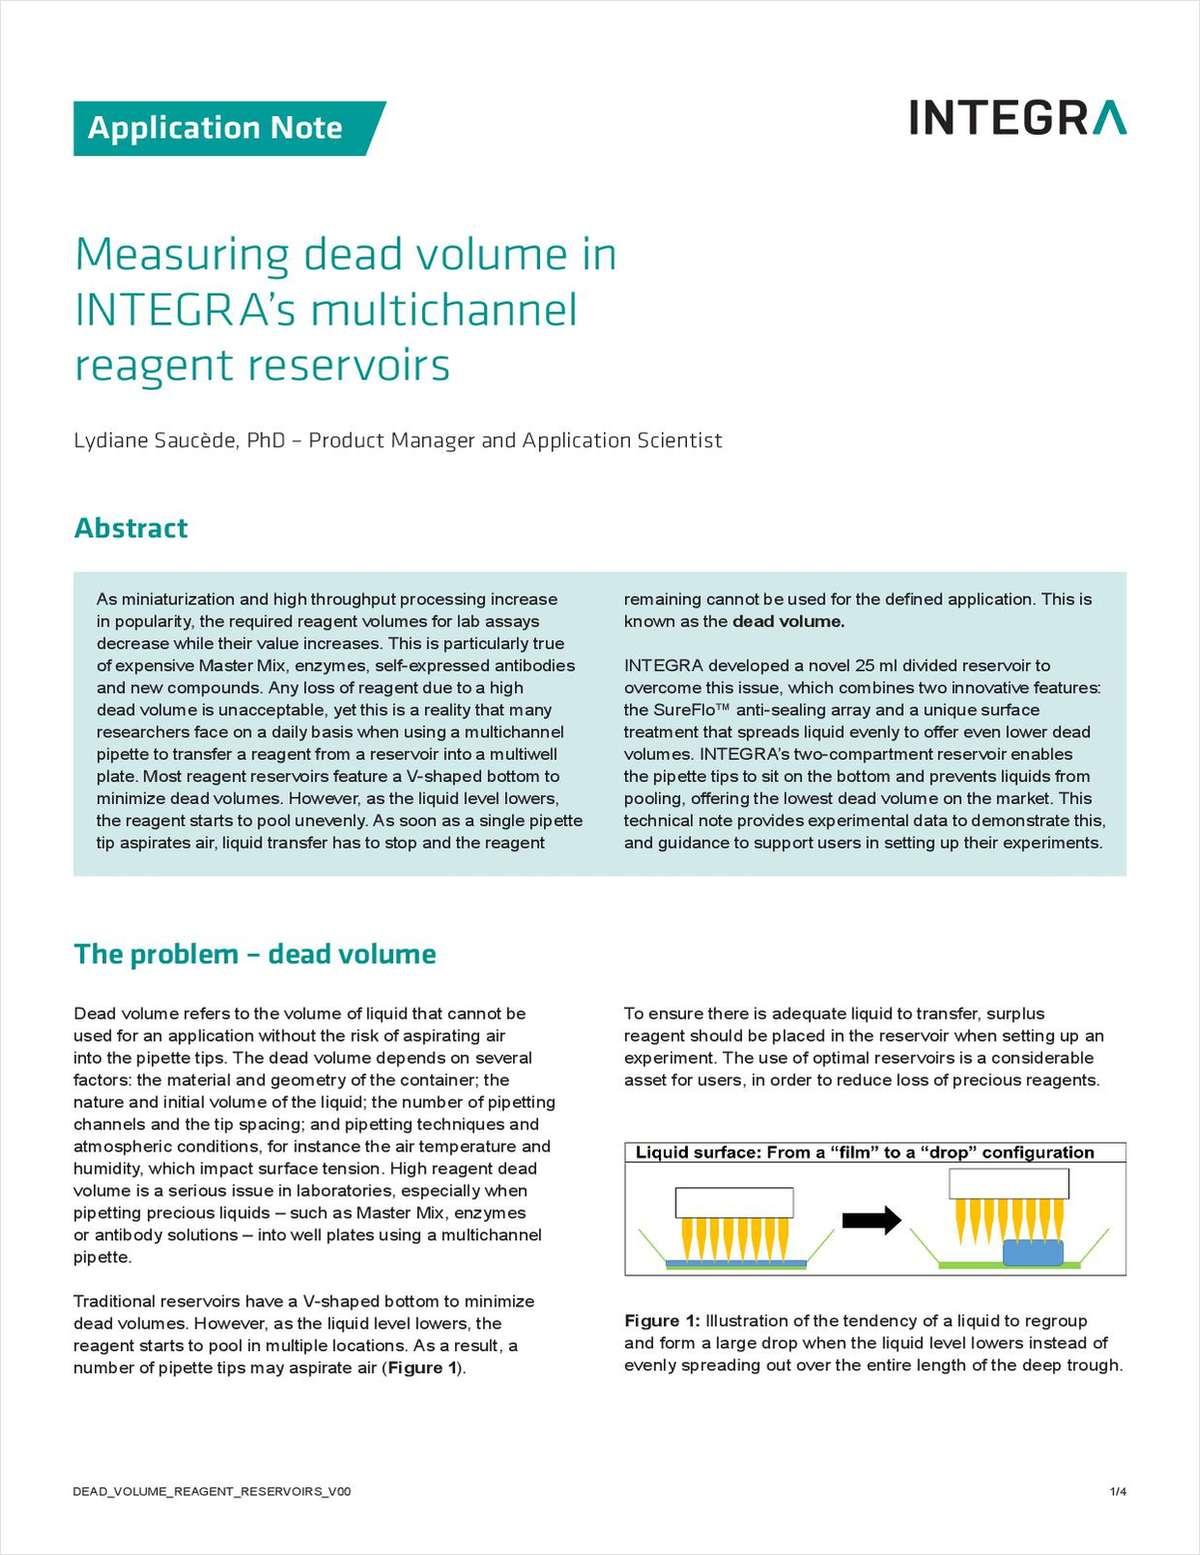 Measuring Dead Volume in INTEGRA's Multichannel Reagent Reservoirs